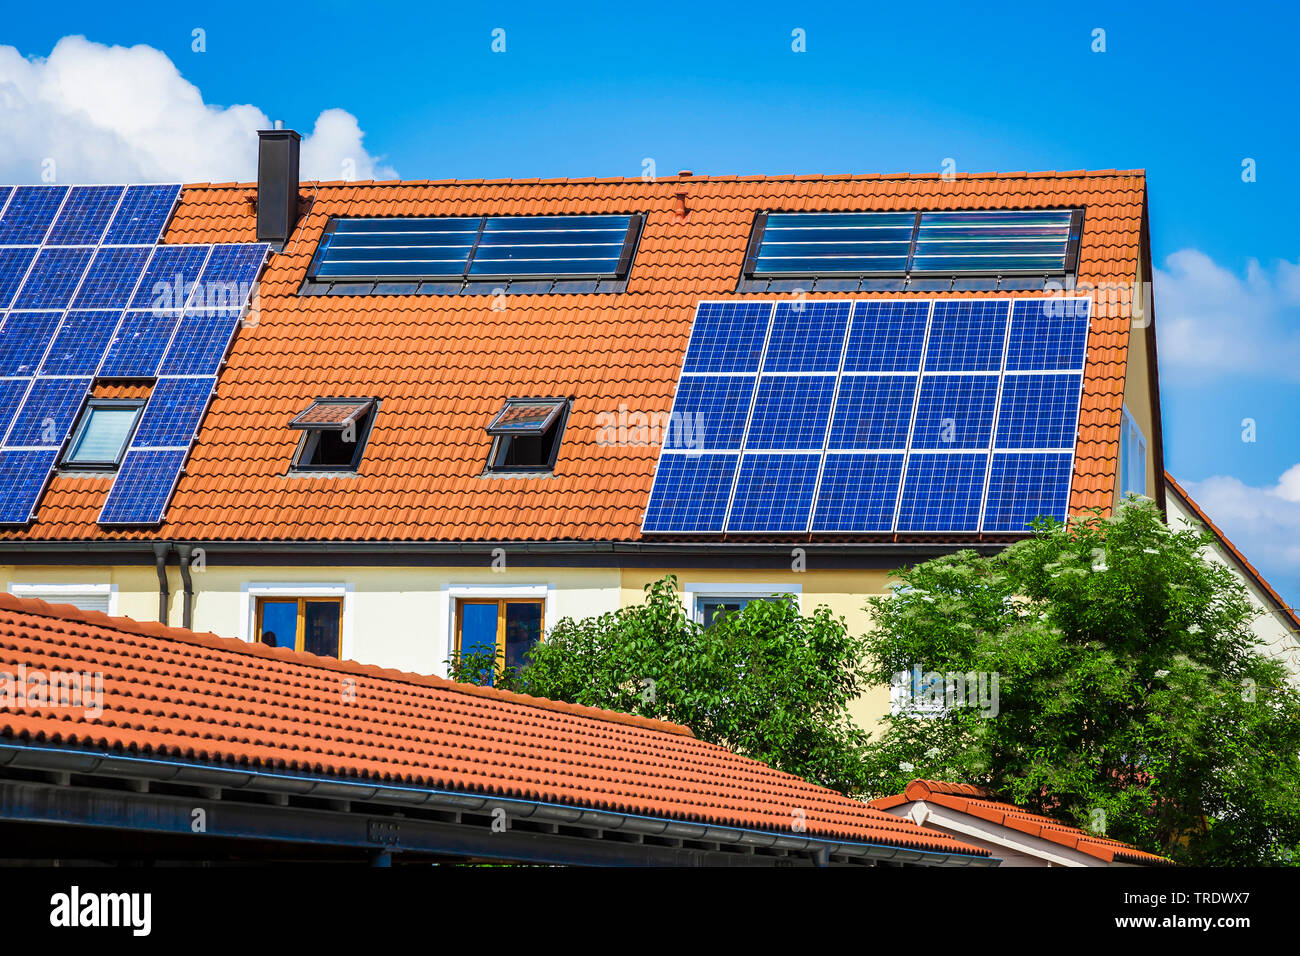 Detailaufnahme eines Hausdachs mit Solarzellen  | Detail of residental house roof with solar panels | BLWS511242.jpg [ (c) blickwinkel/McPHOTO/M. Gann - Stock Image